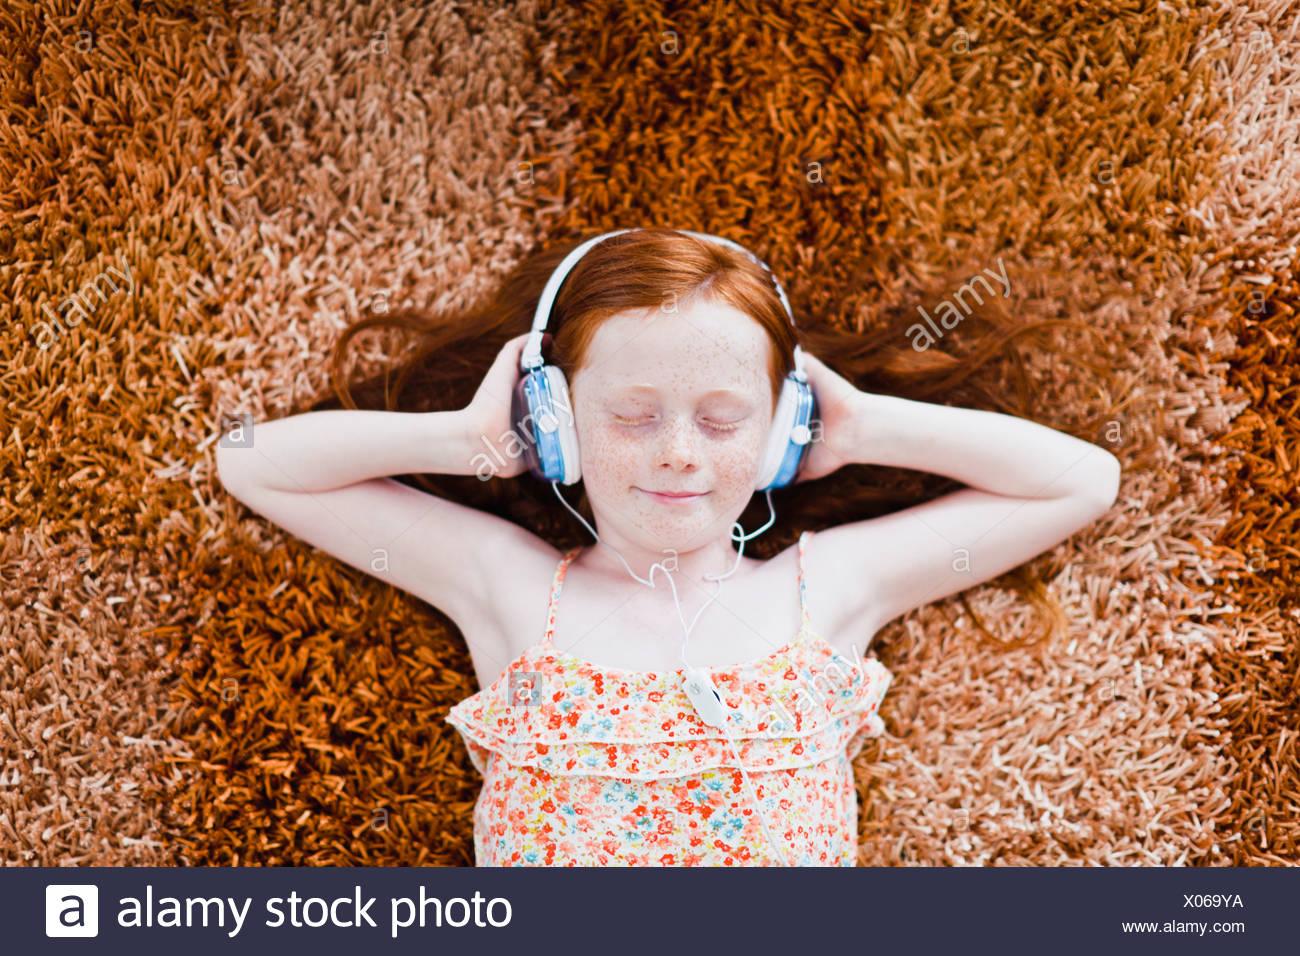 Girl listening to headphones on carpet Photo Stock